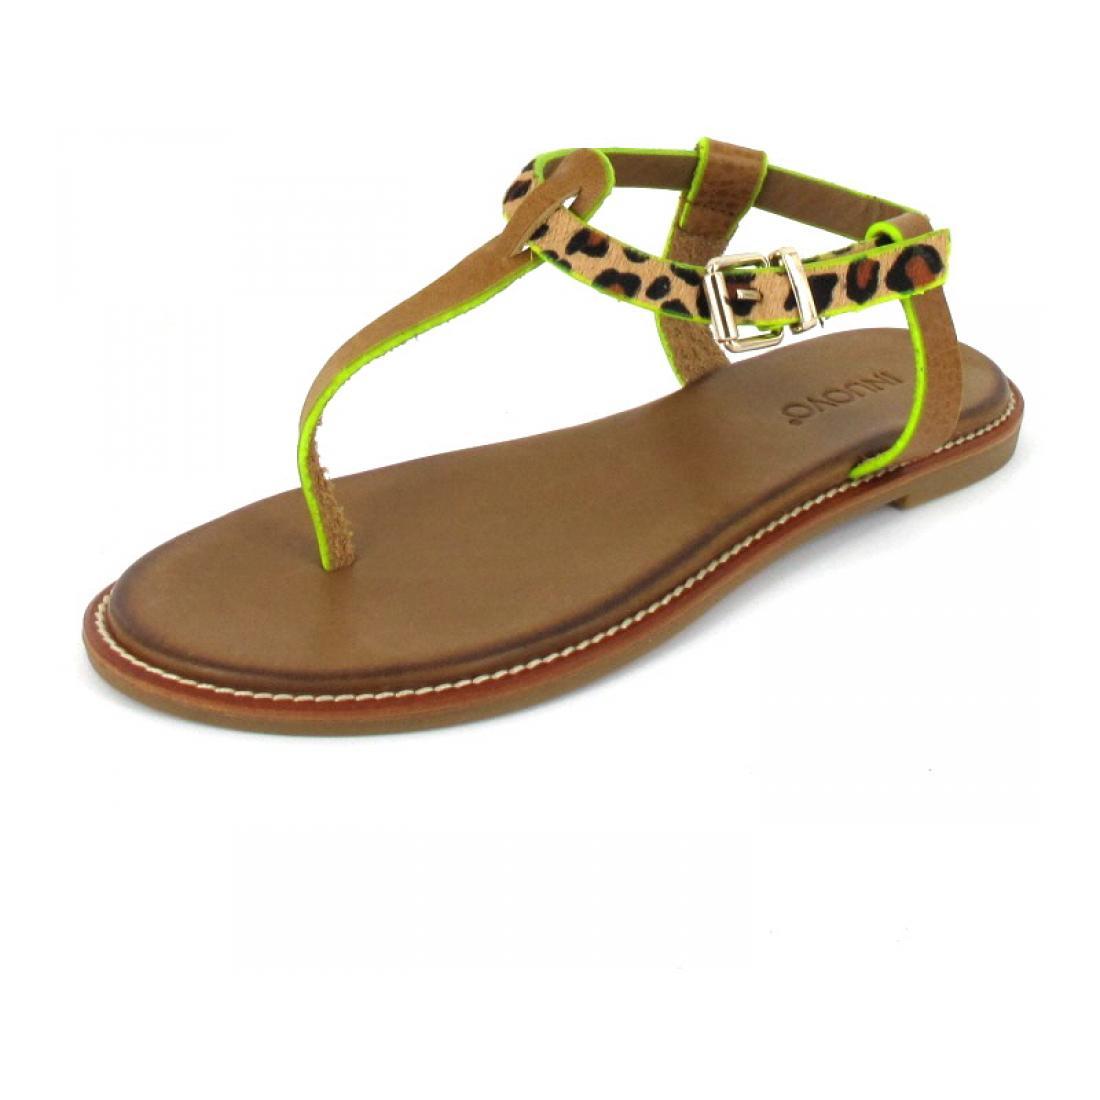 Inuovo Sandalette Sandals Camel-Leo- Neon Y